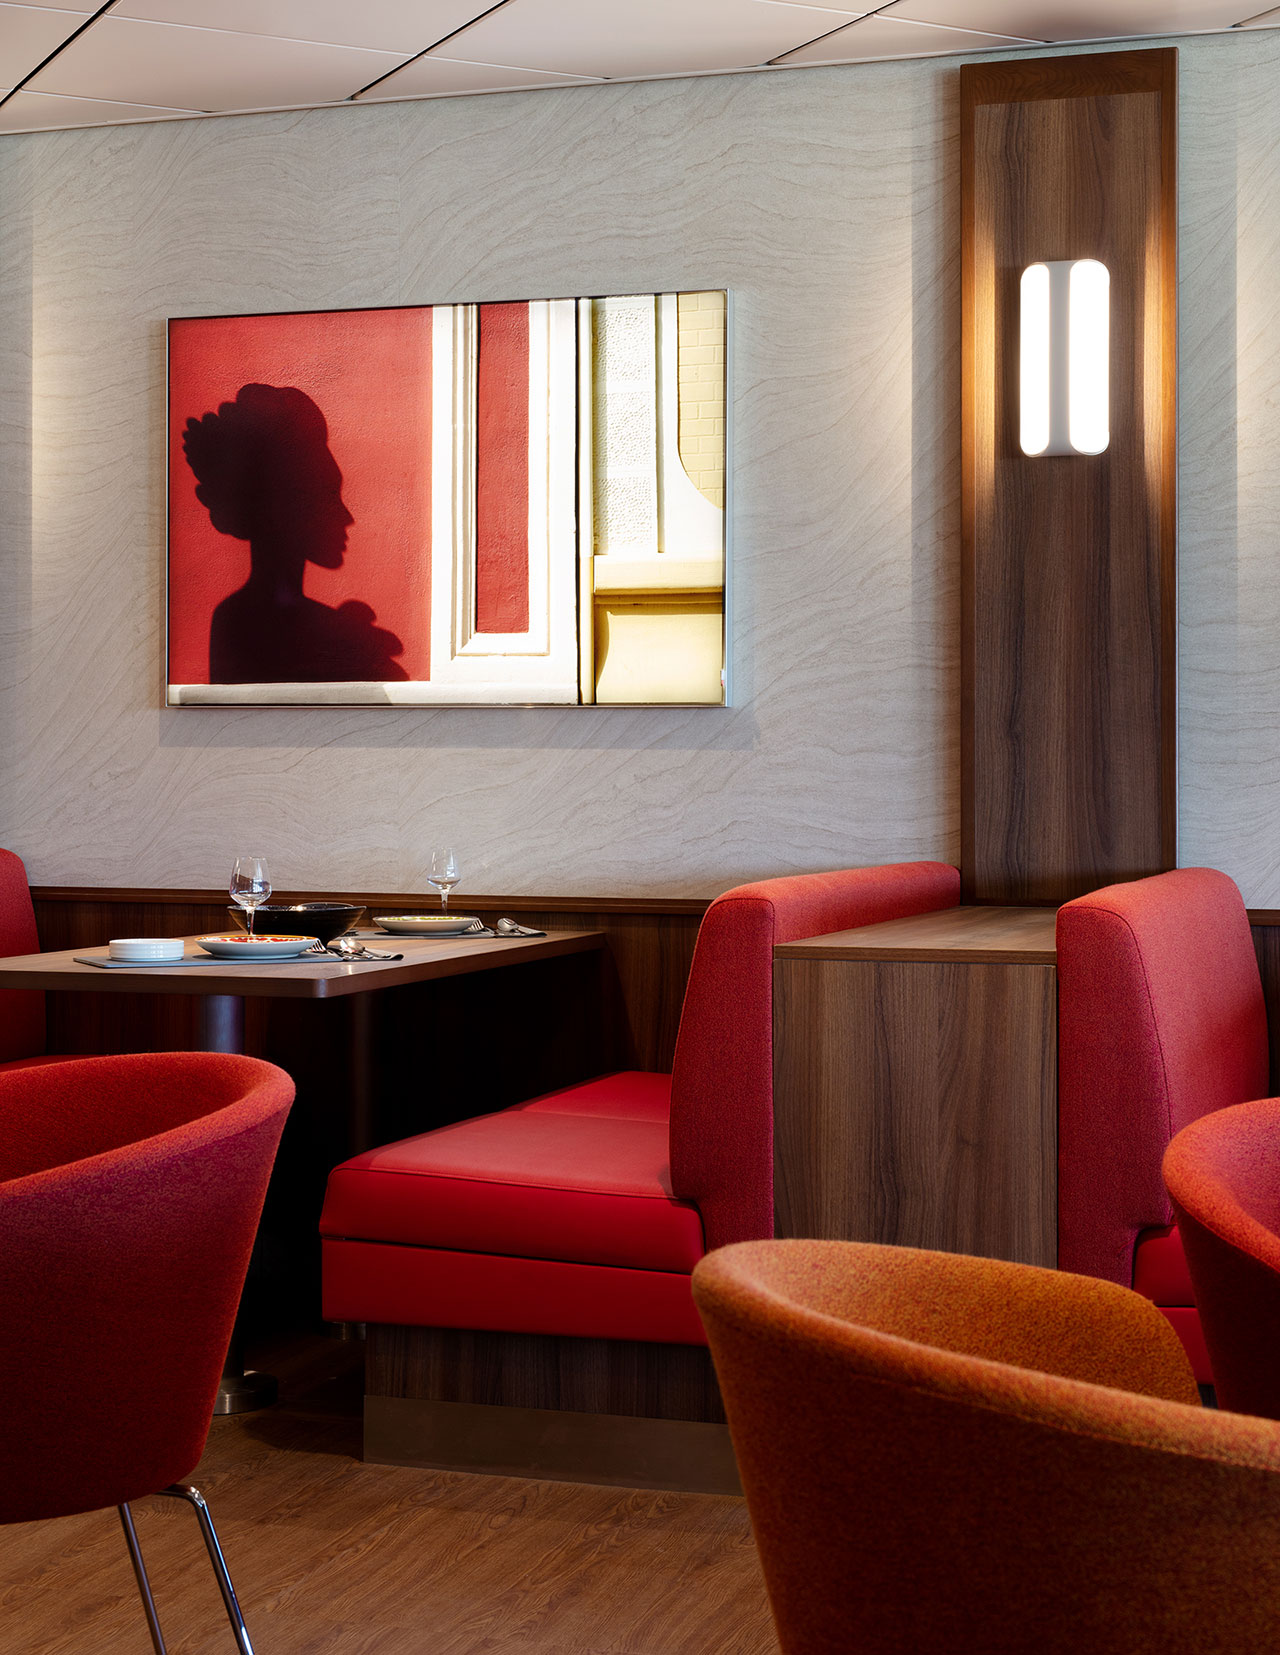 Taberna de TapasRestaurant. Art & Photography by Klunderbie.